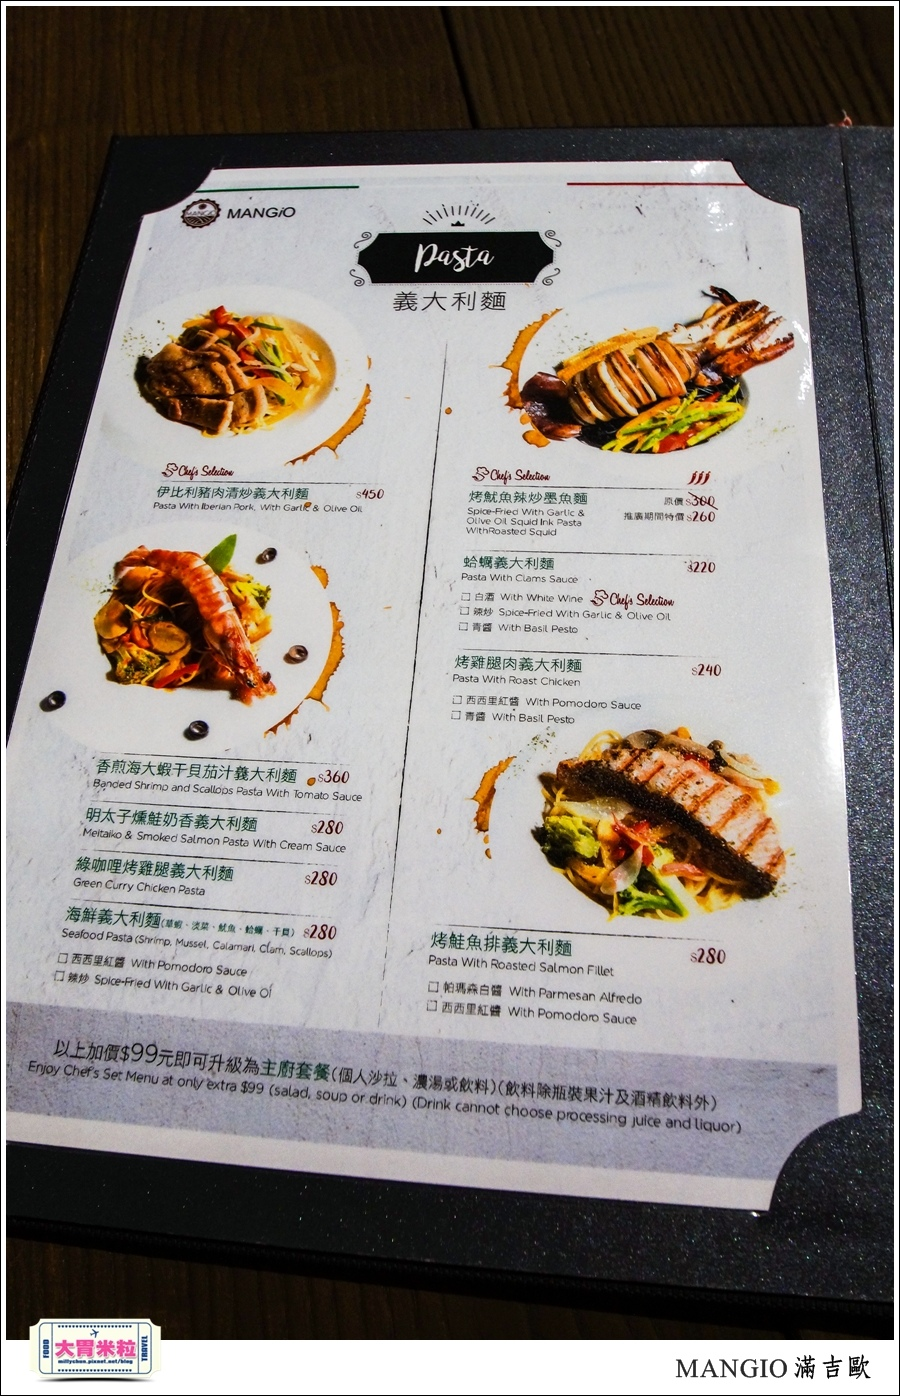 MANGiO Bistro 滿吉歐義式樂活餐酒館@台北餐酒館推薦@大胃米粒0061.jpg